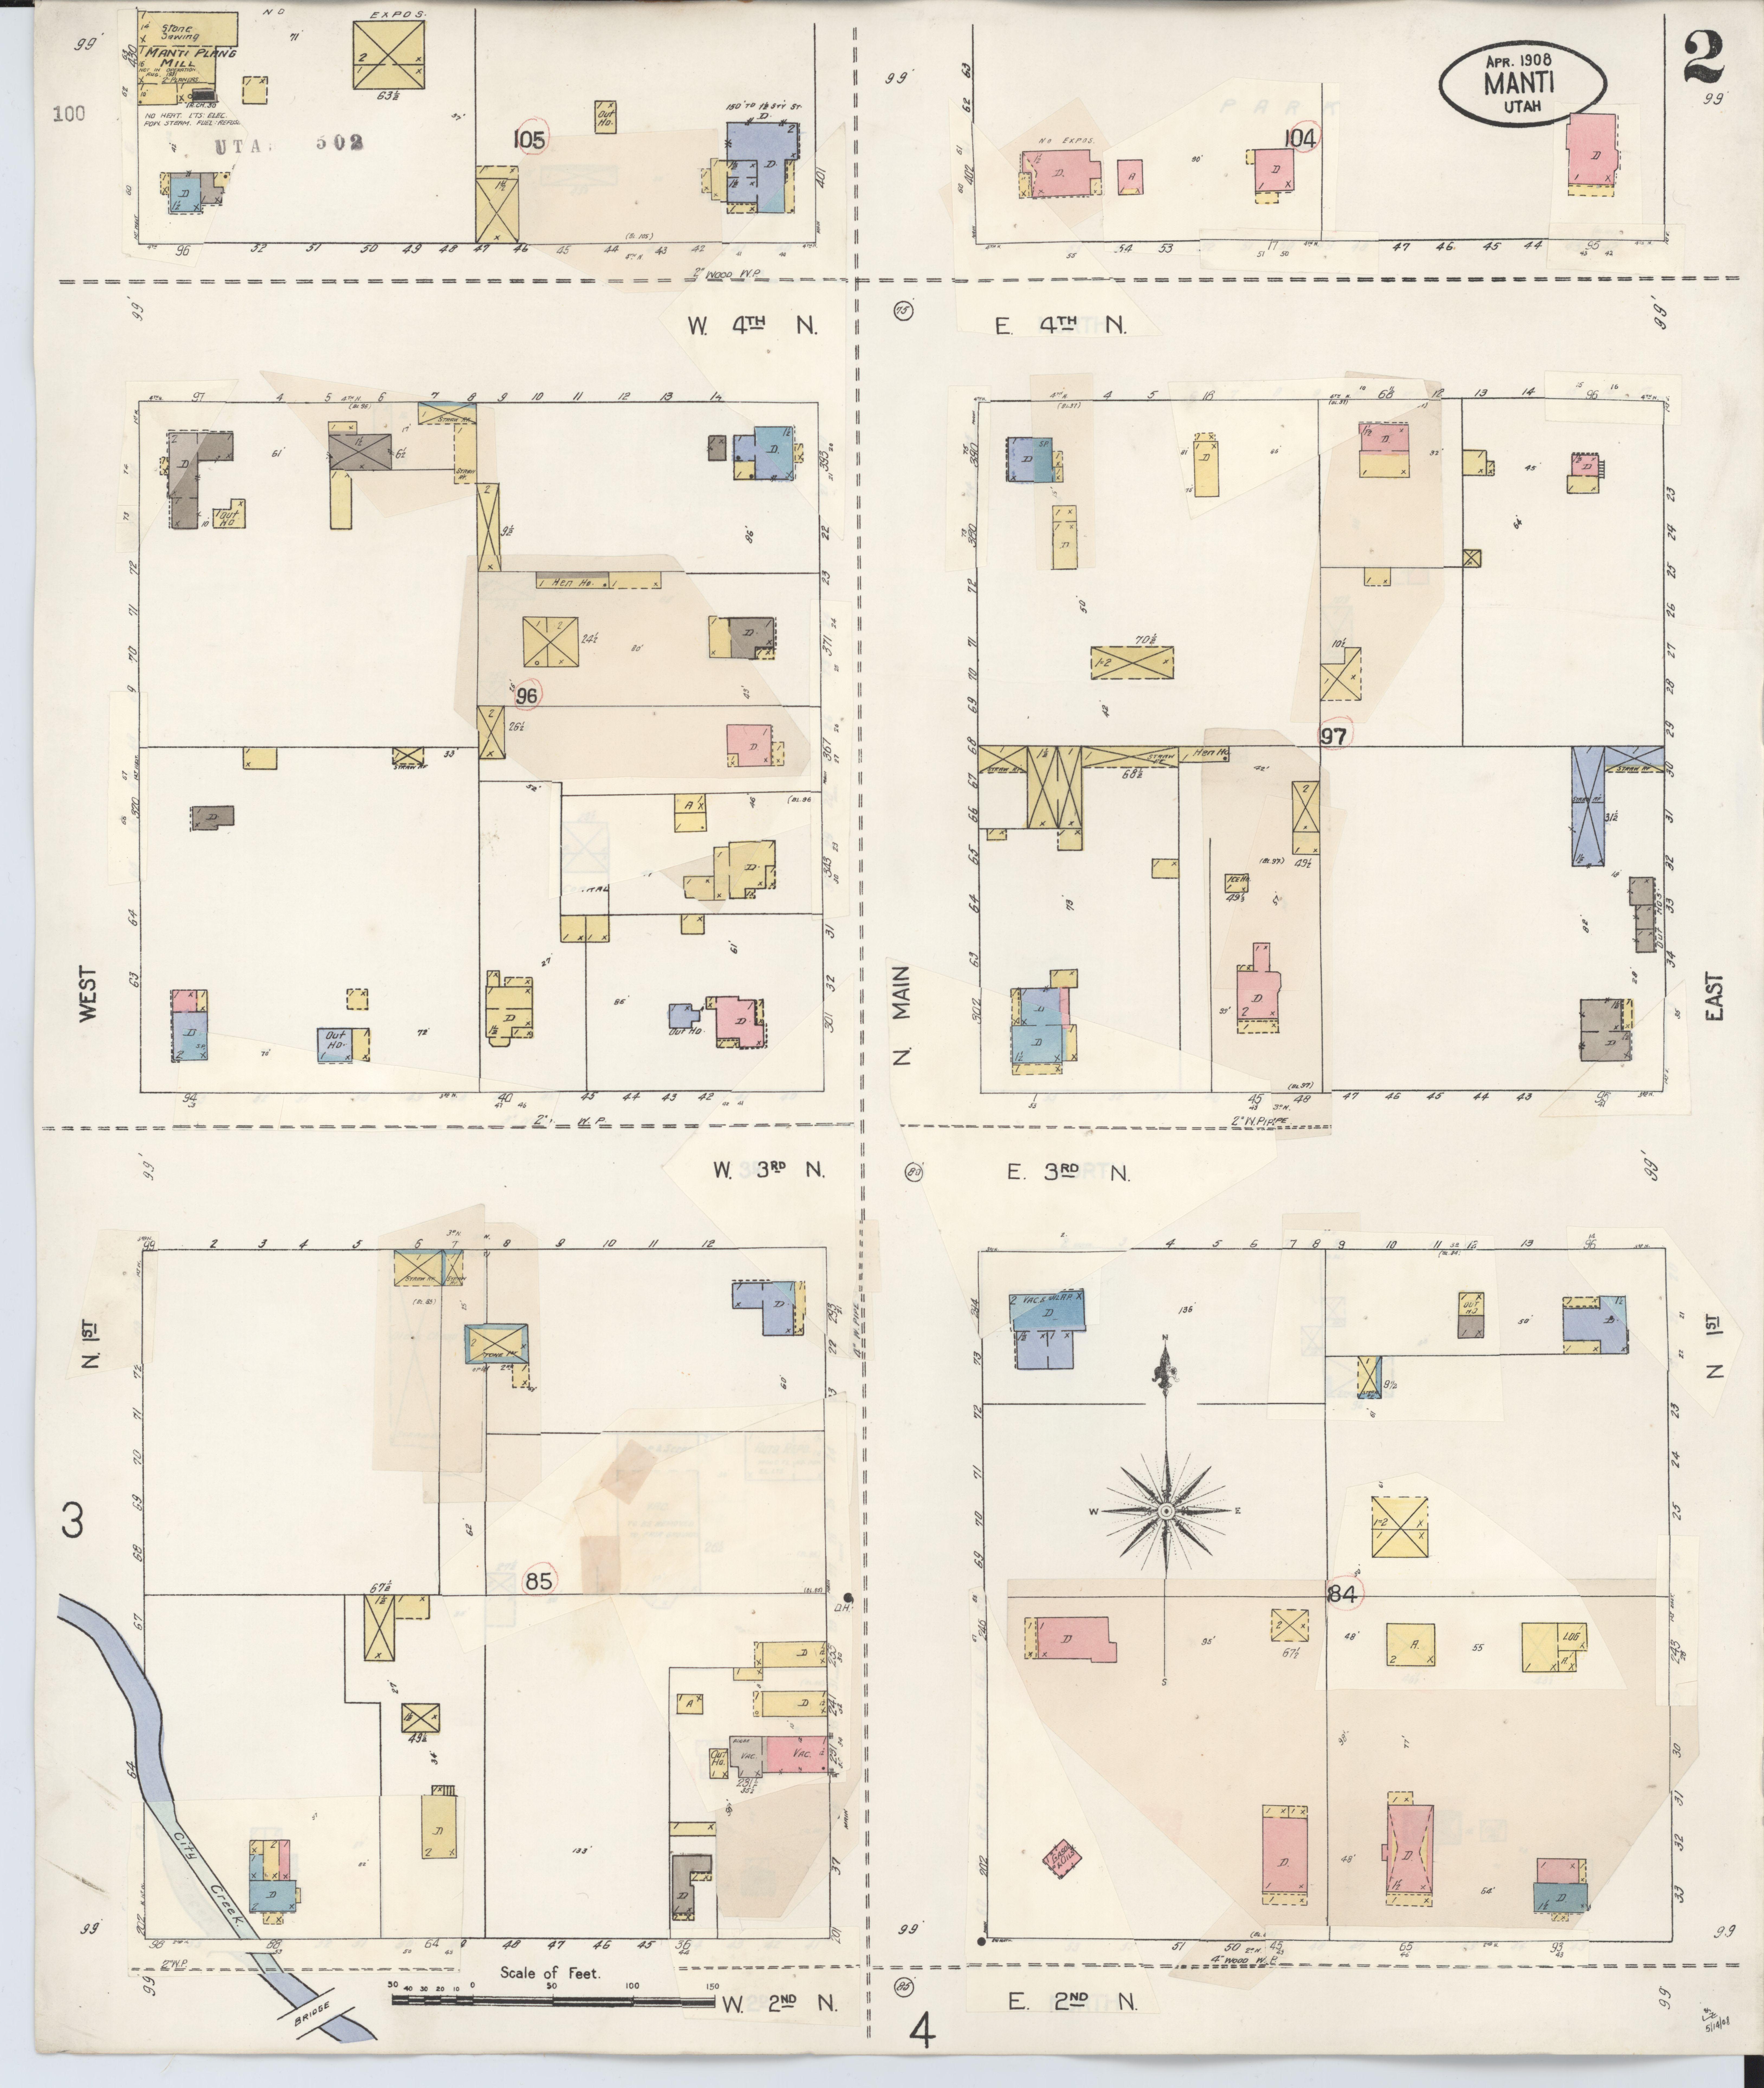 File Sanborn Fire Insurance Map From Manti Sanpete County Utah